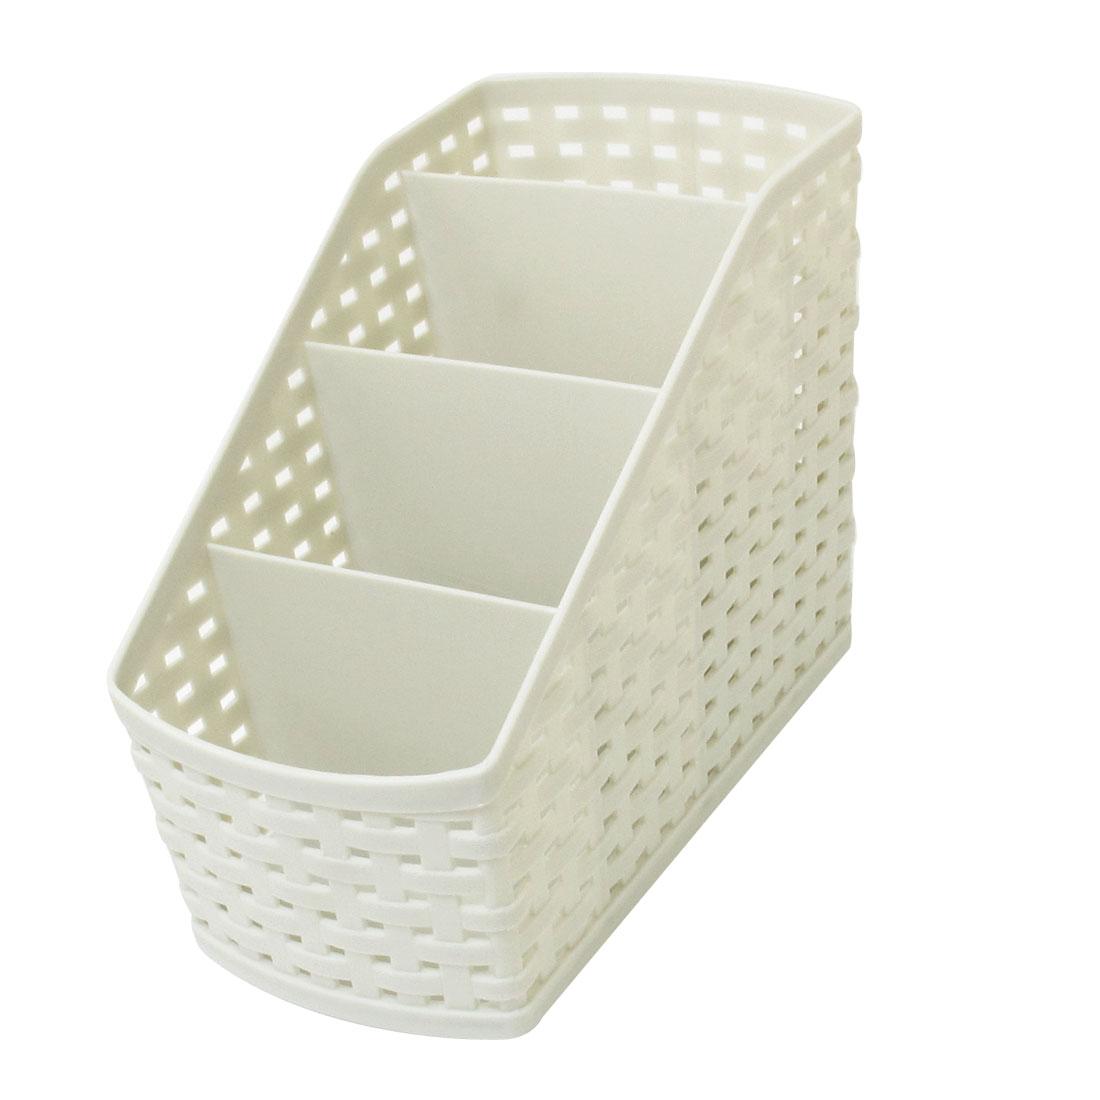 Imitation Rattan Design Desktop Plastic 4 Grids Storage Case Box Gray